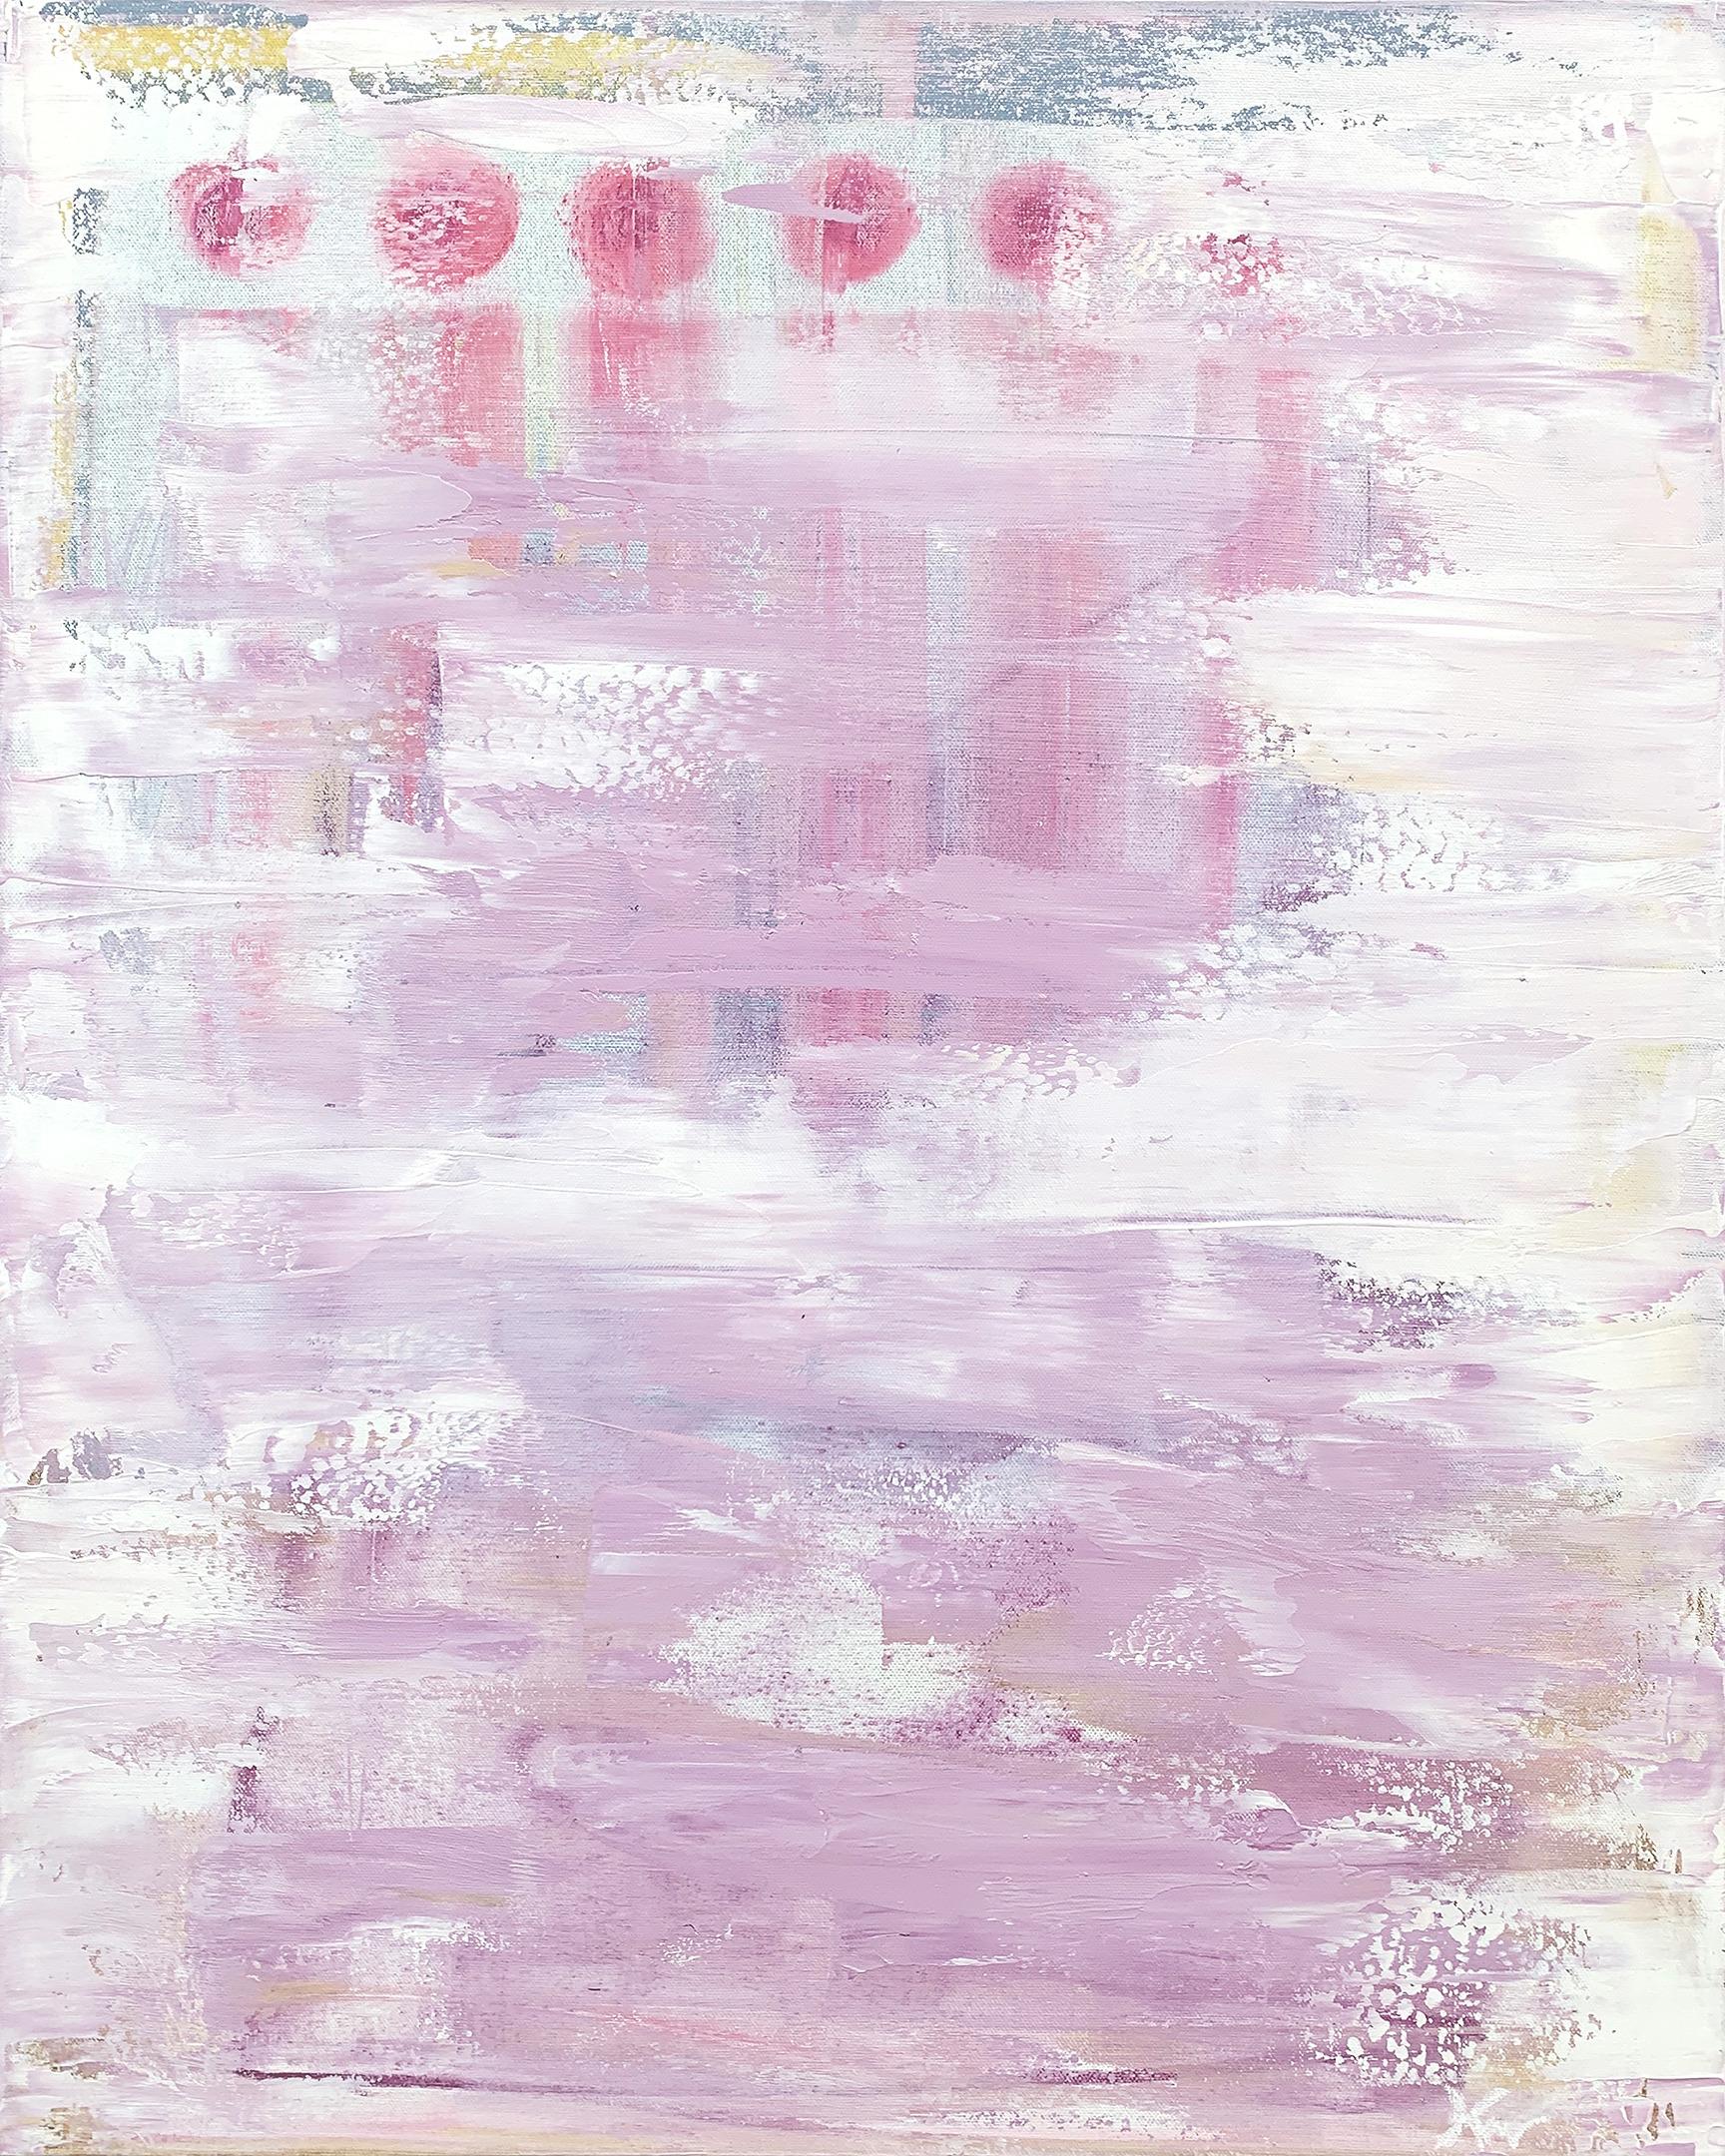 Katewilson.harmony.paintingoncanvas.30x24inches.2019.lr mdh0q7